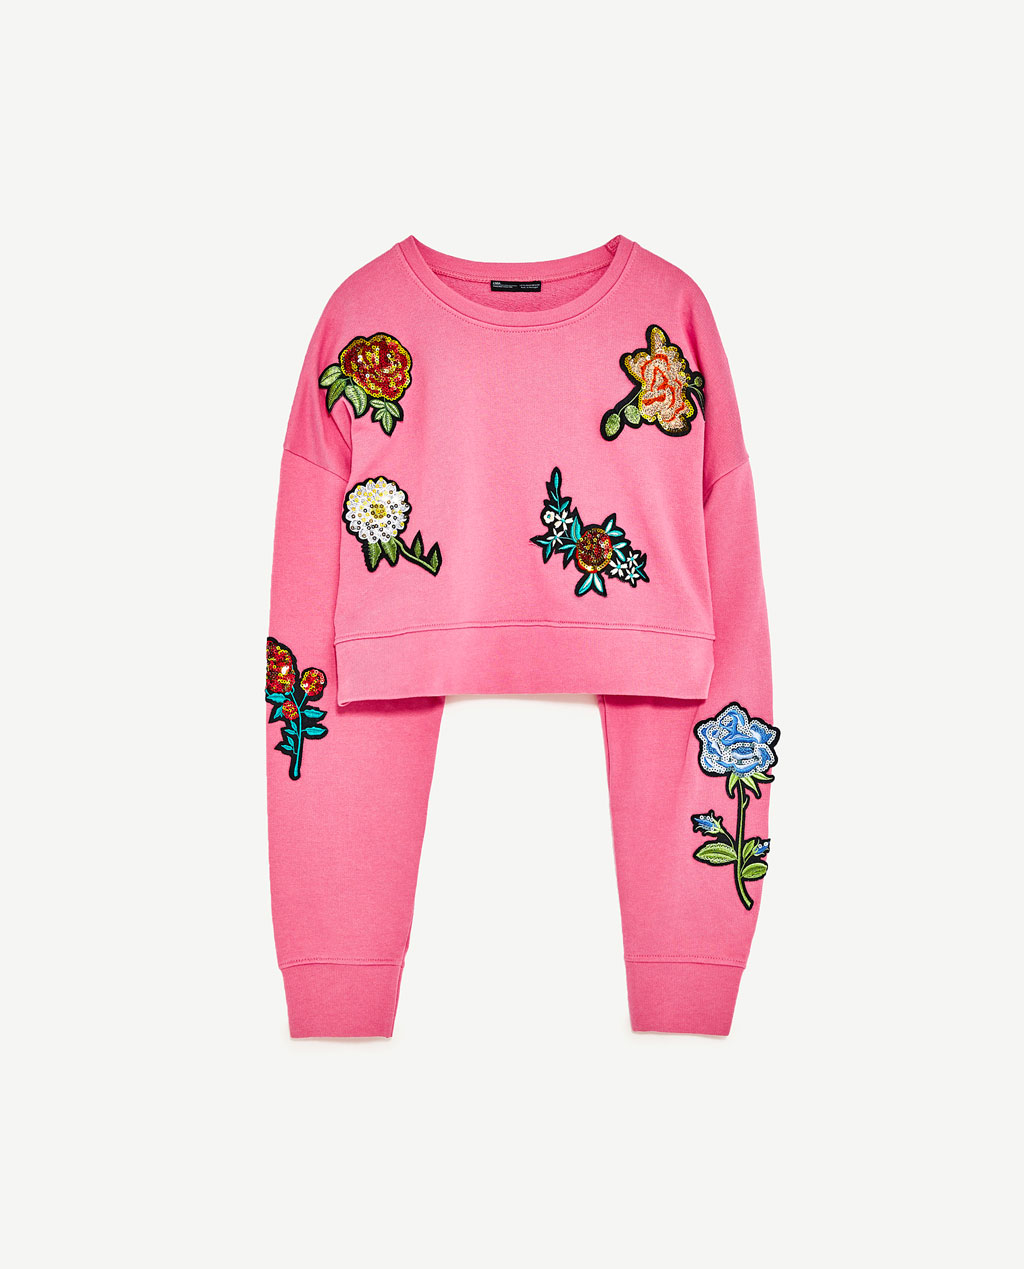 Femme Site Populaire De Sweat Wqdcxobre Robe Zara Mode – WQCxeodErB